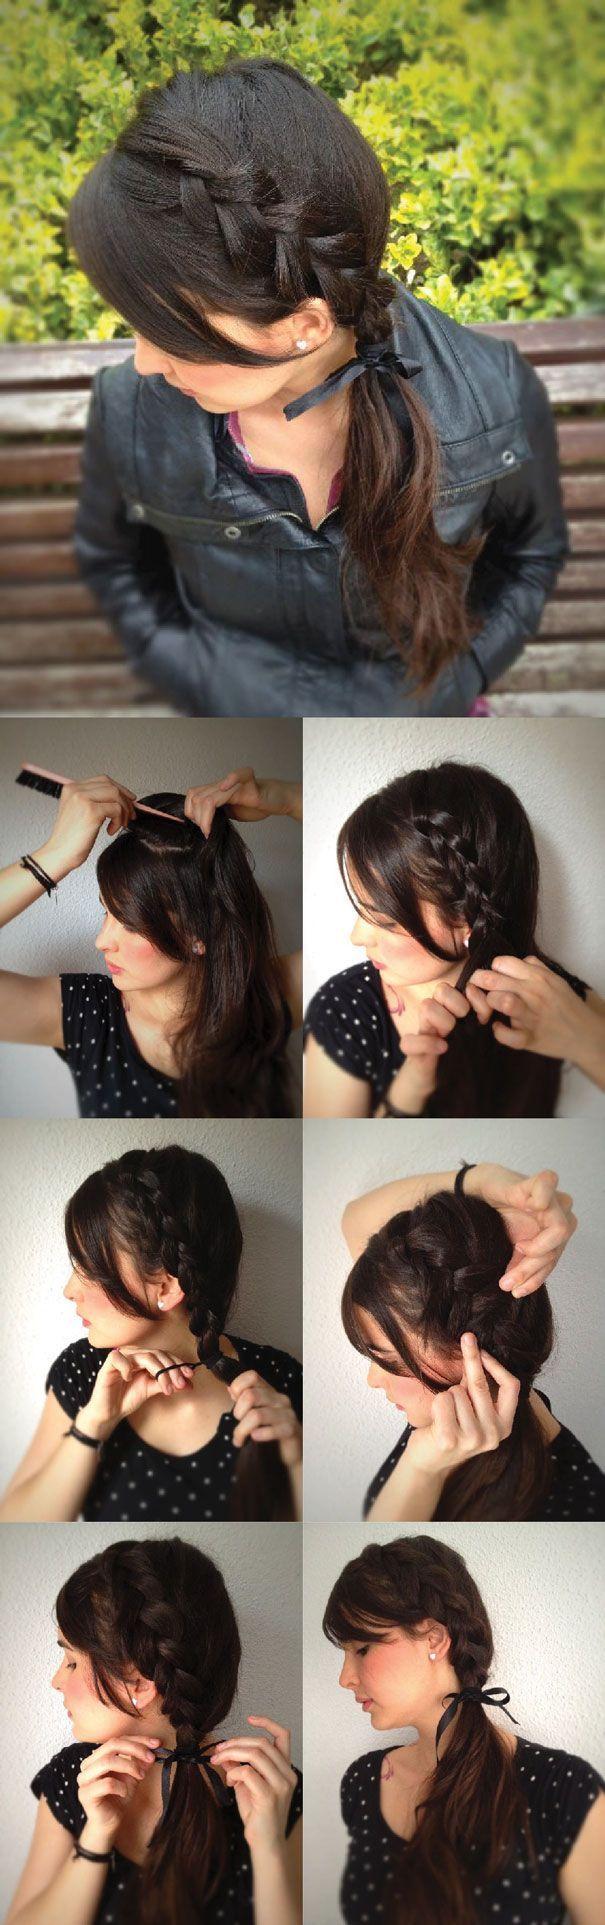 Braid to side ponytail|How to Do a Retro Side Ponytail | Braid Tutorials - Howcast